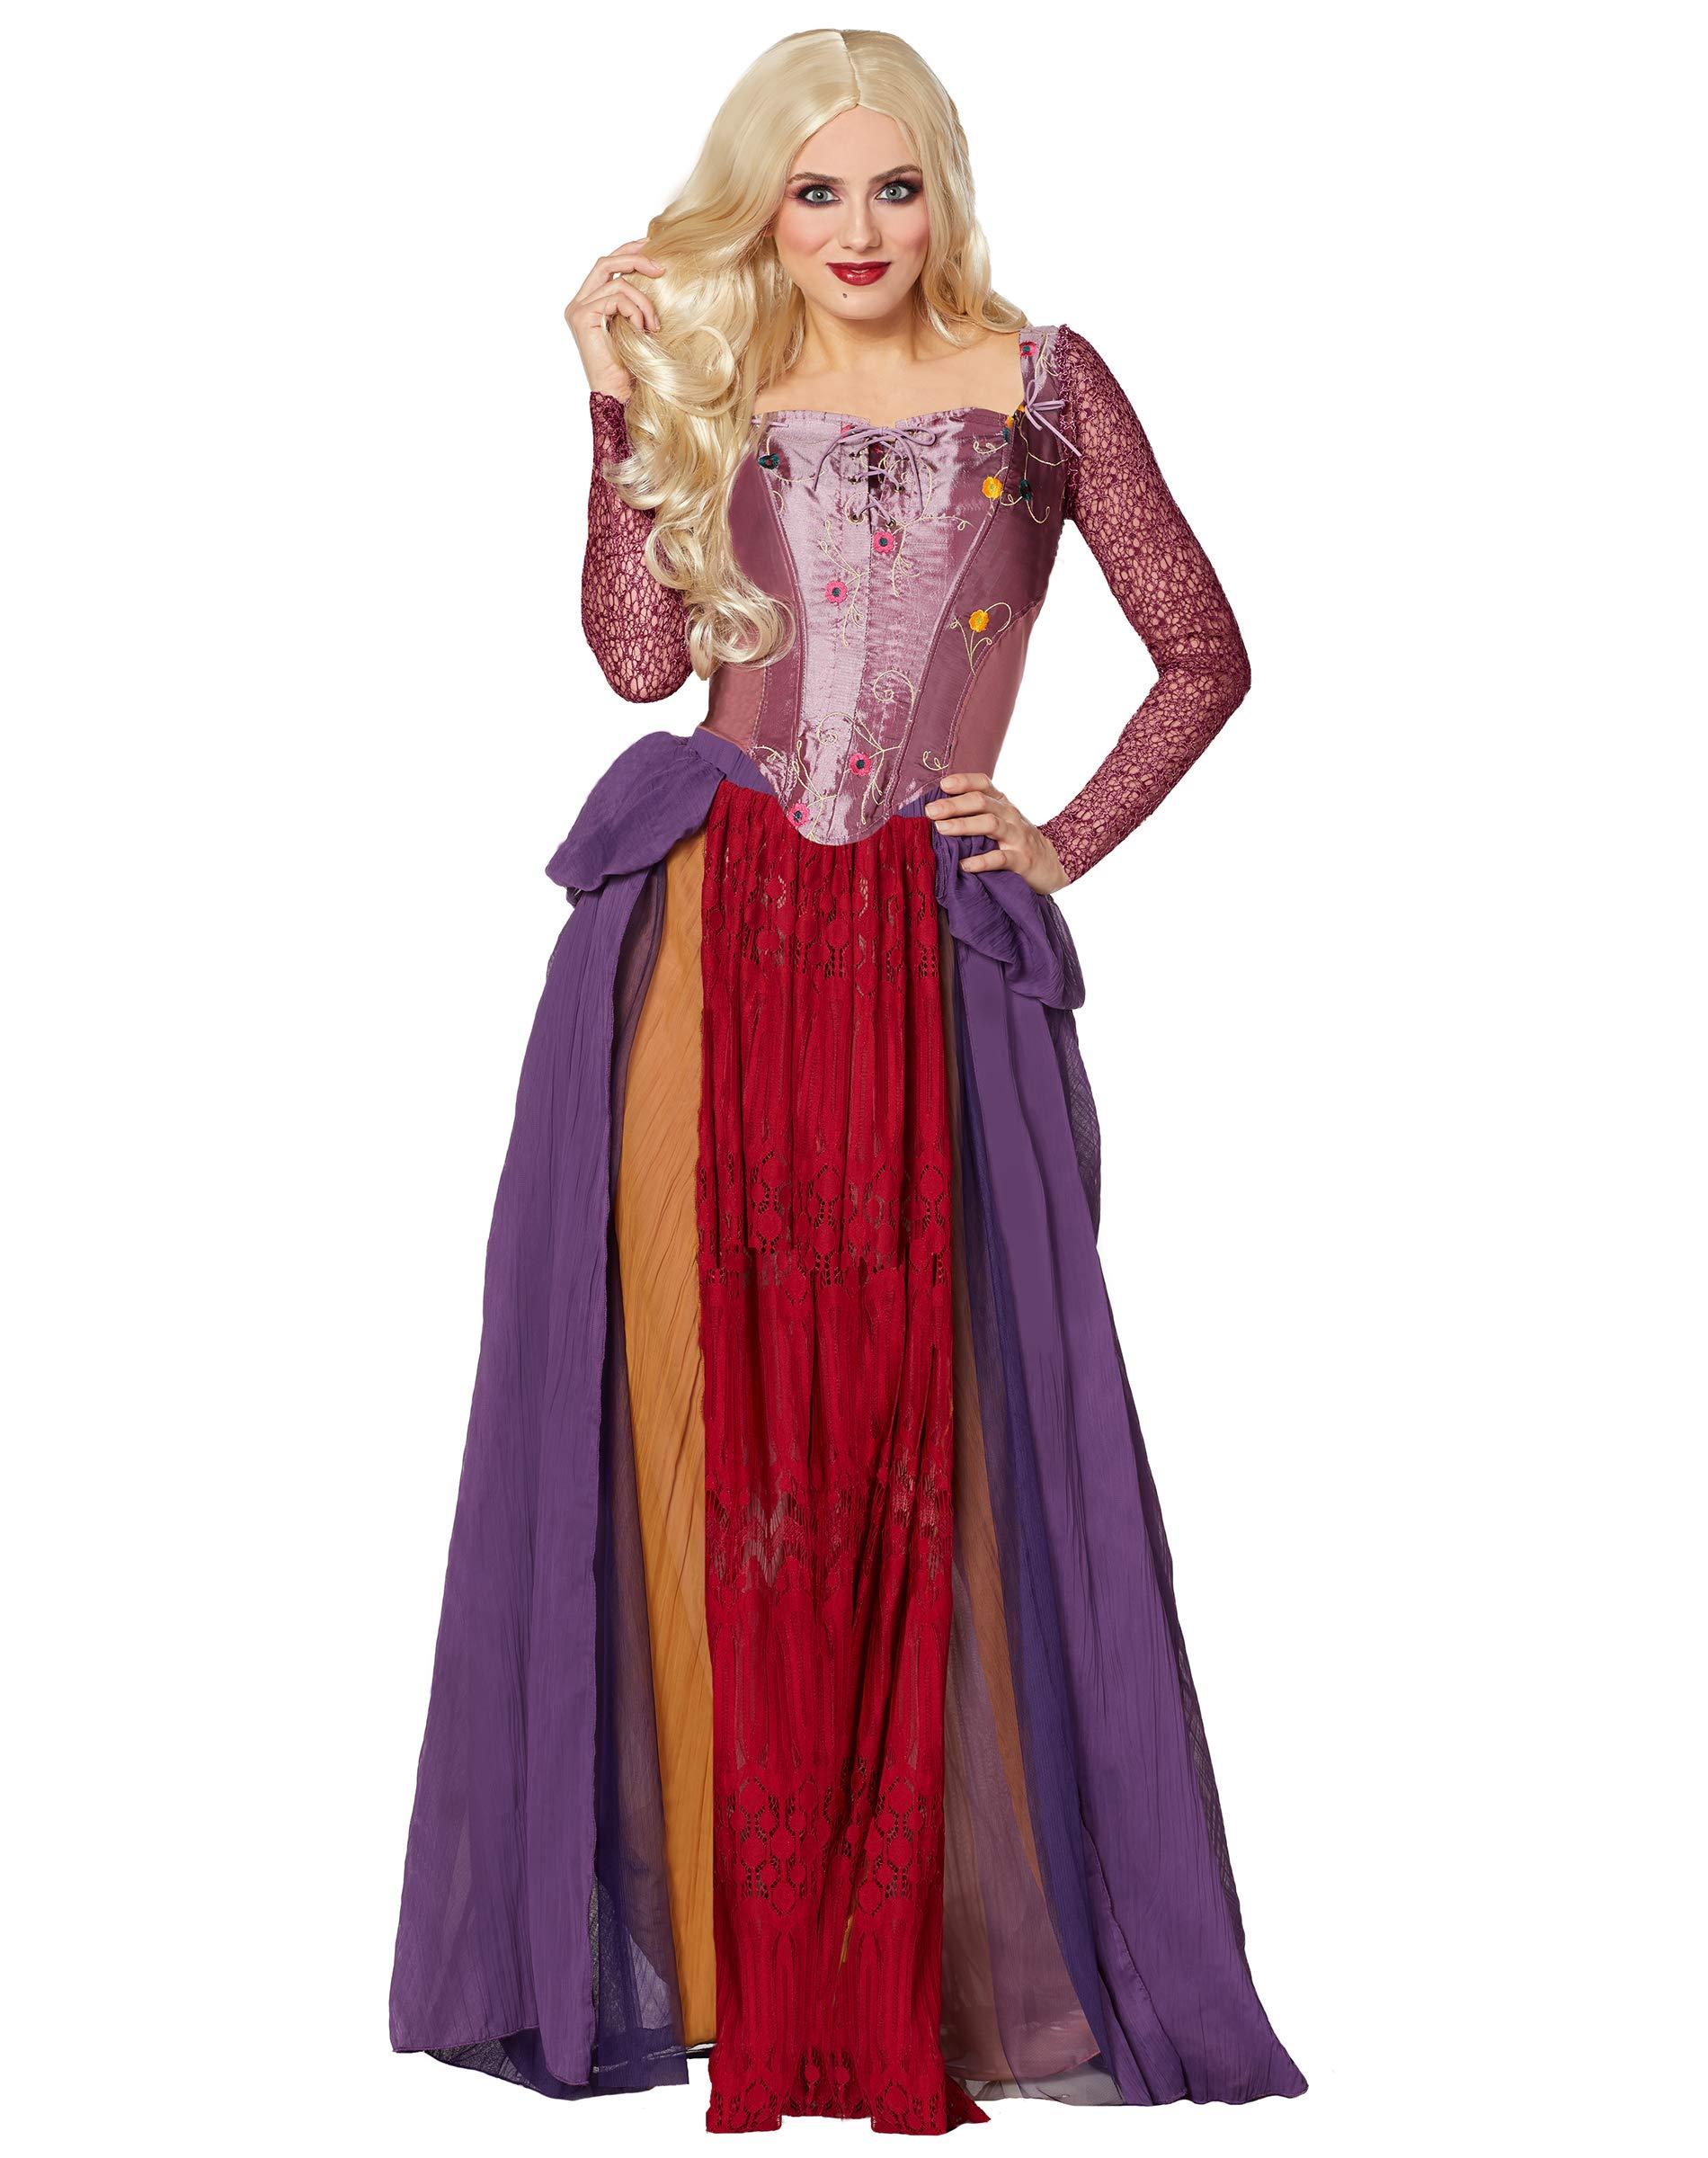 Spirit Halloween Adult Sarah Sanderson Deluxe Hocus Pocus Costume | Officially Licensed